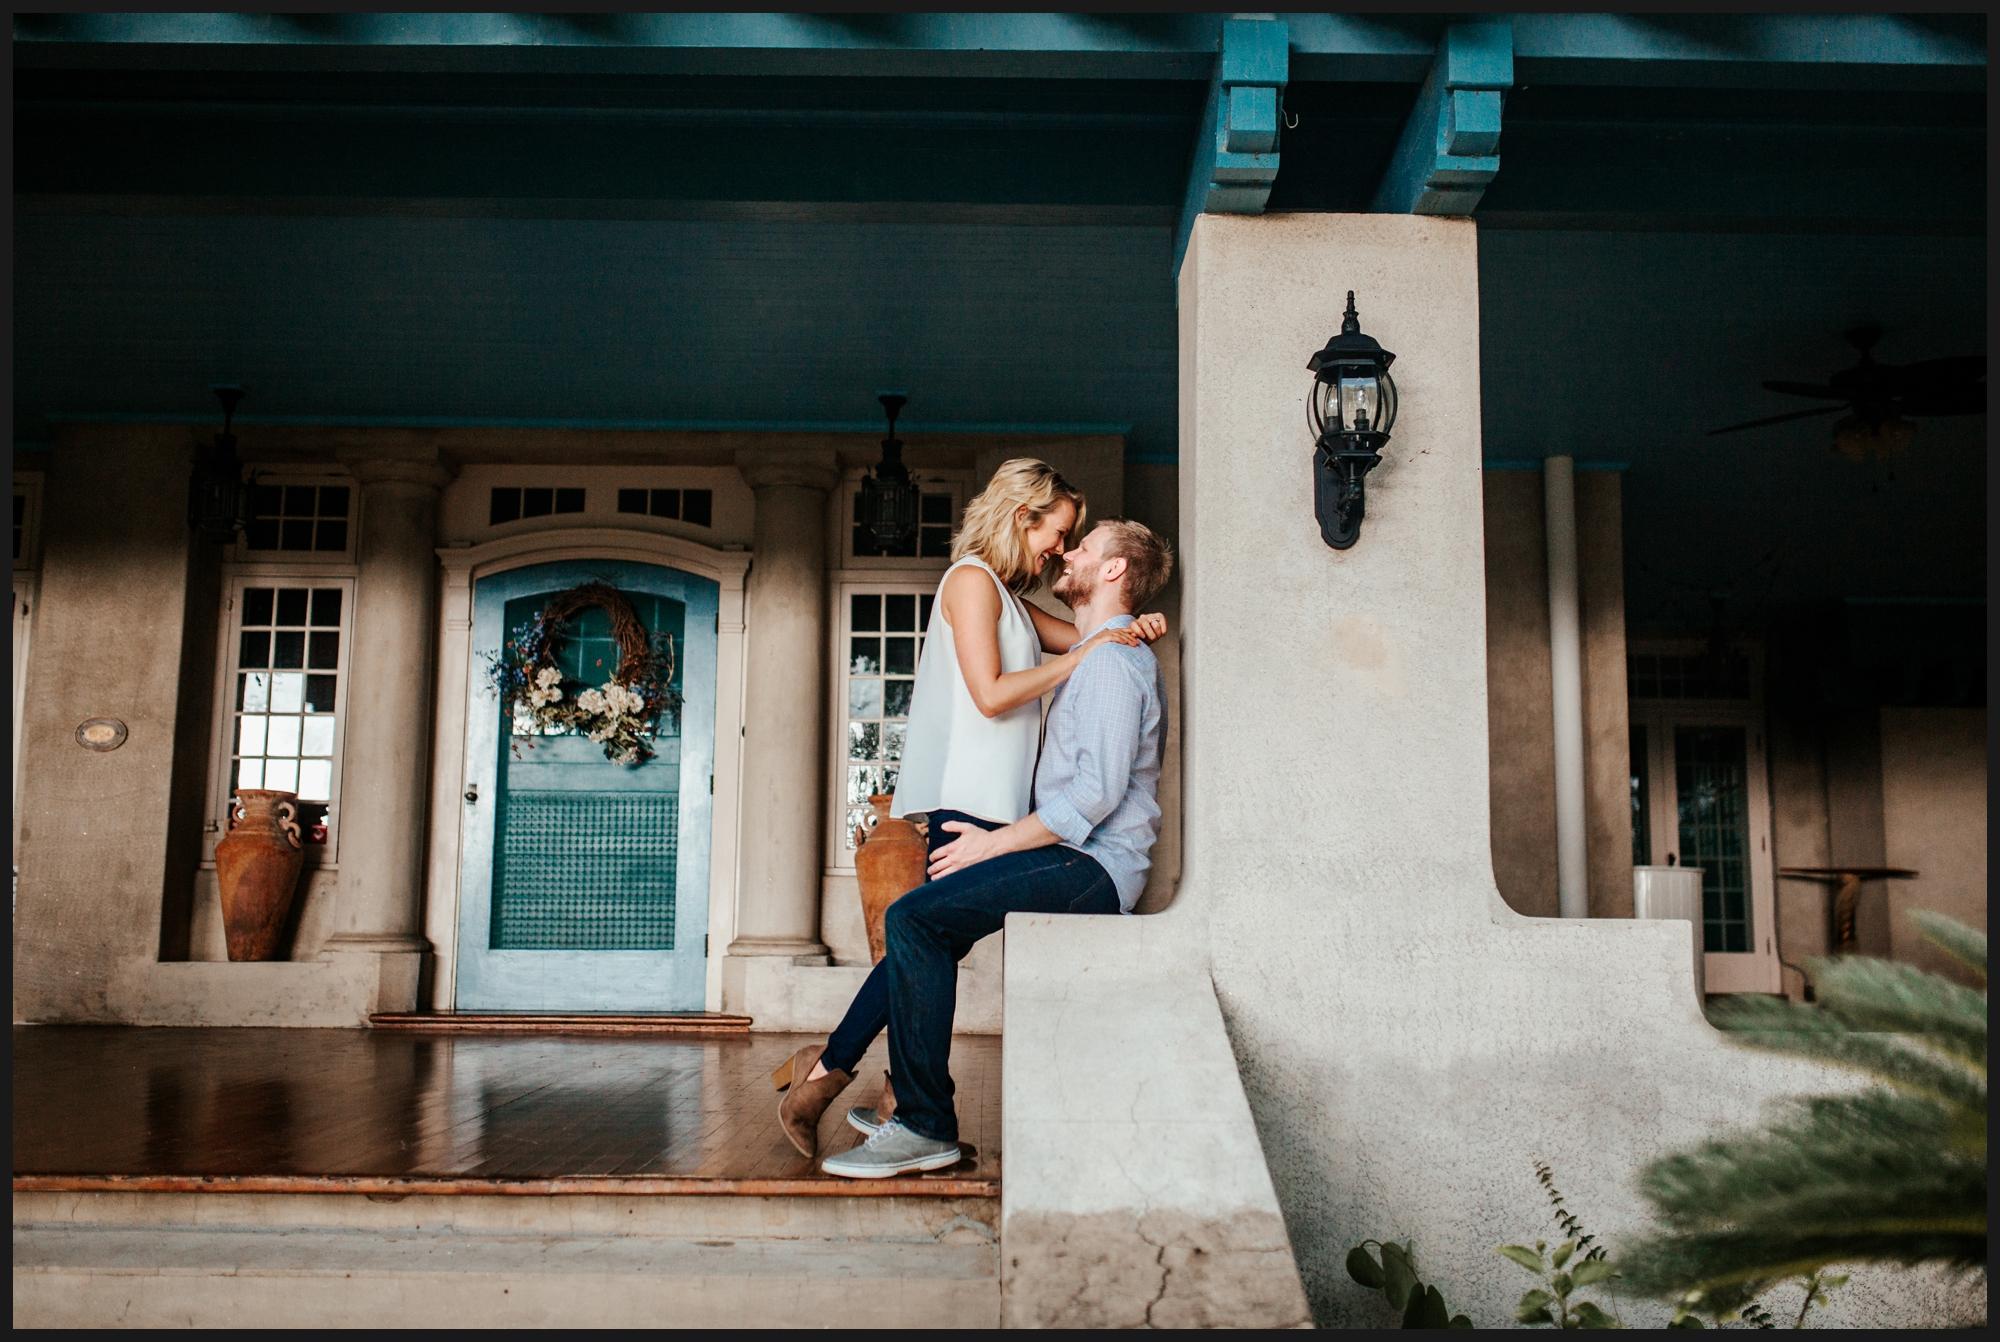 Orlando-Wedding-Photographer-destination-wedding-photographer-florida-wedding-photographer-bohemian-wedding-photographer_0200.jpg